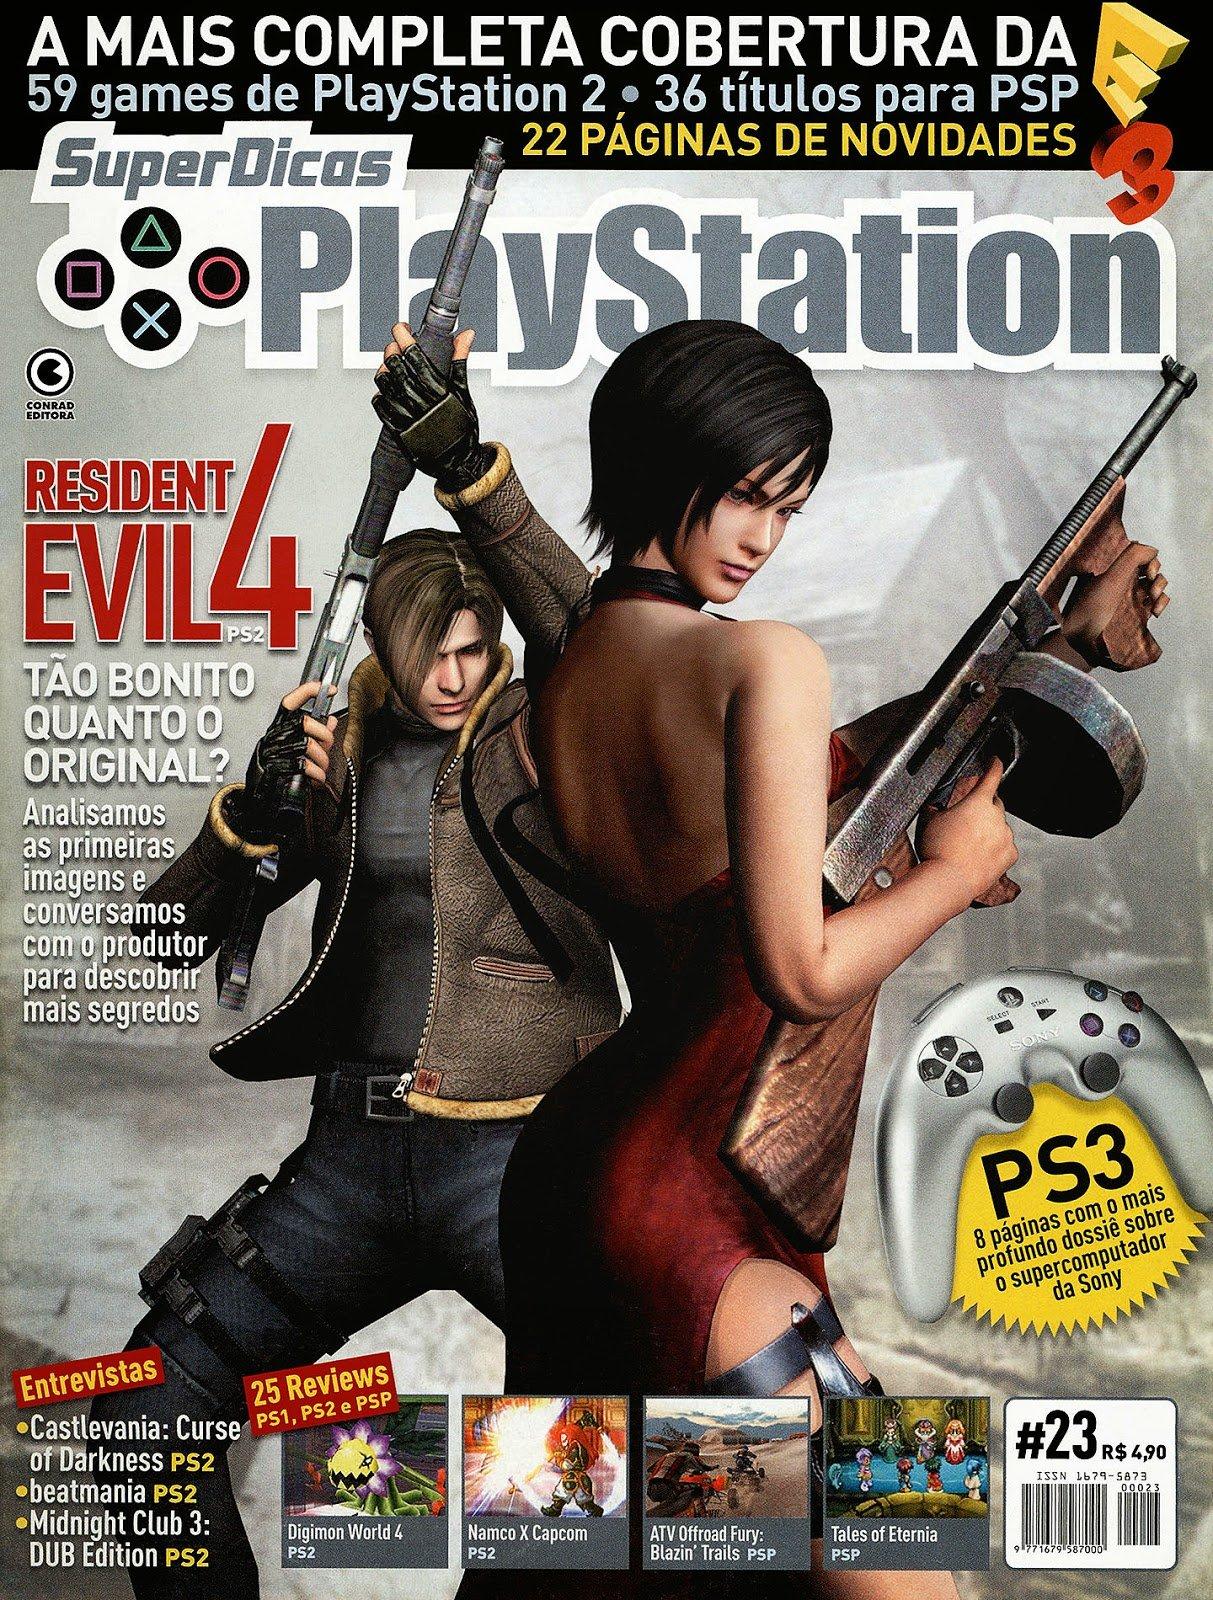 Super Dicas Playstation 23 (July 2005)